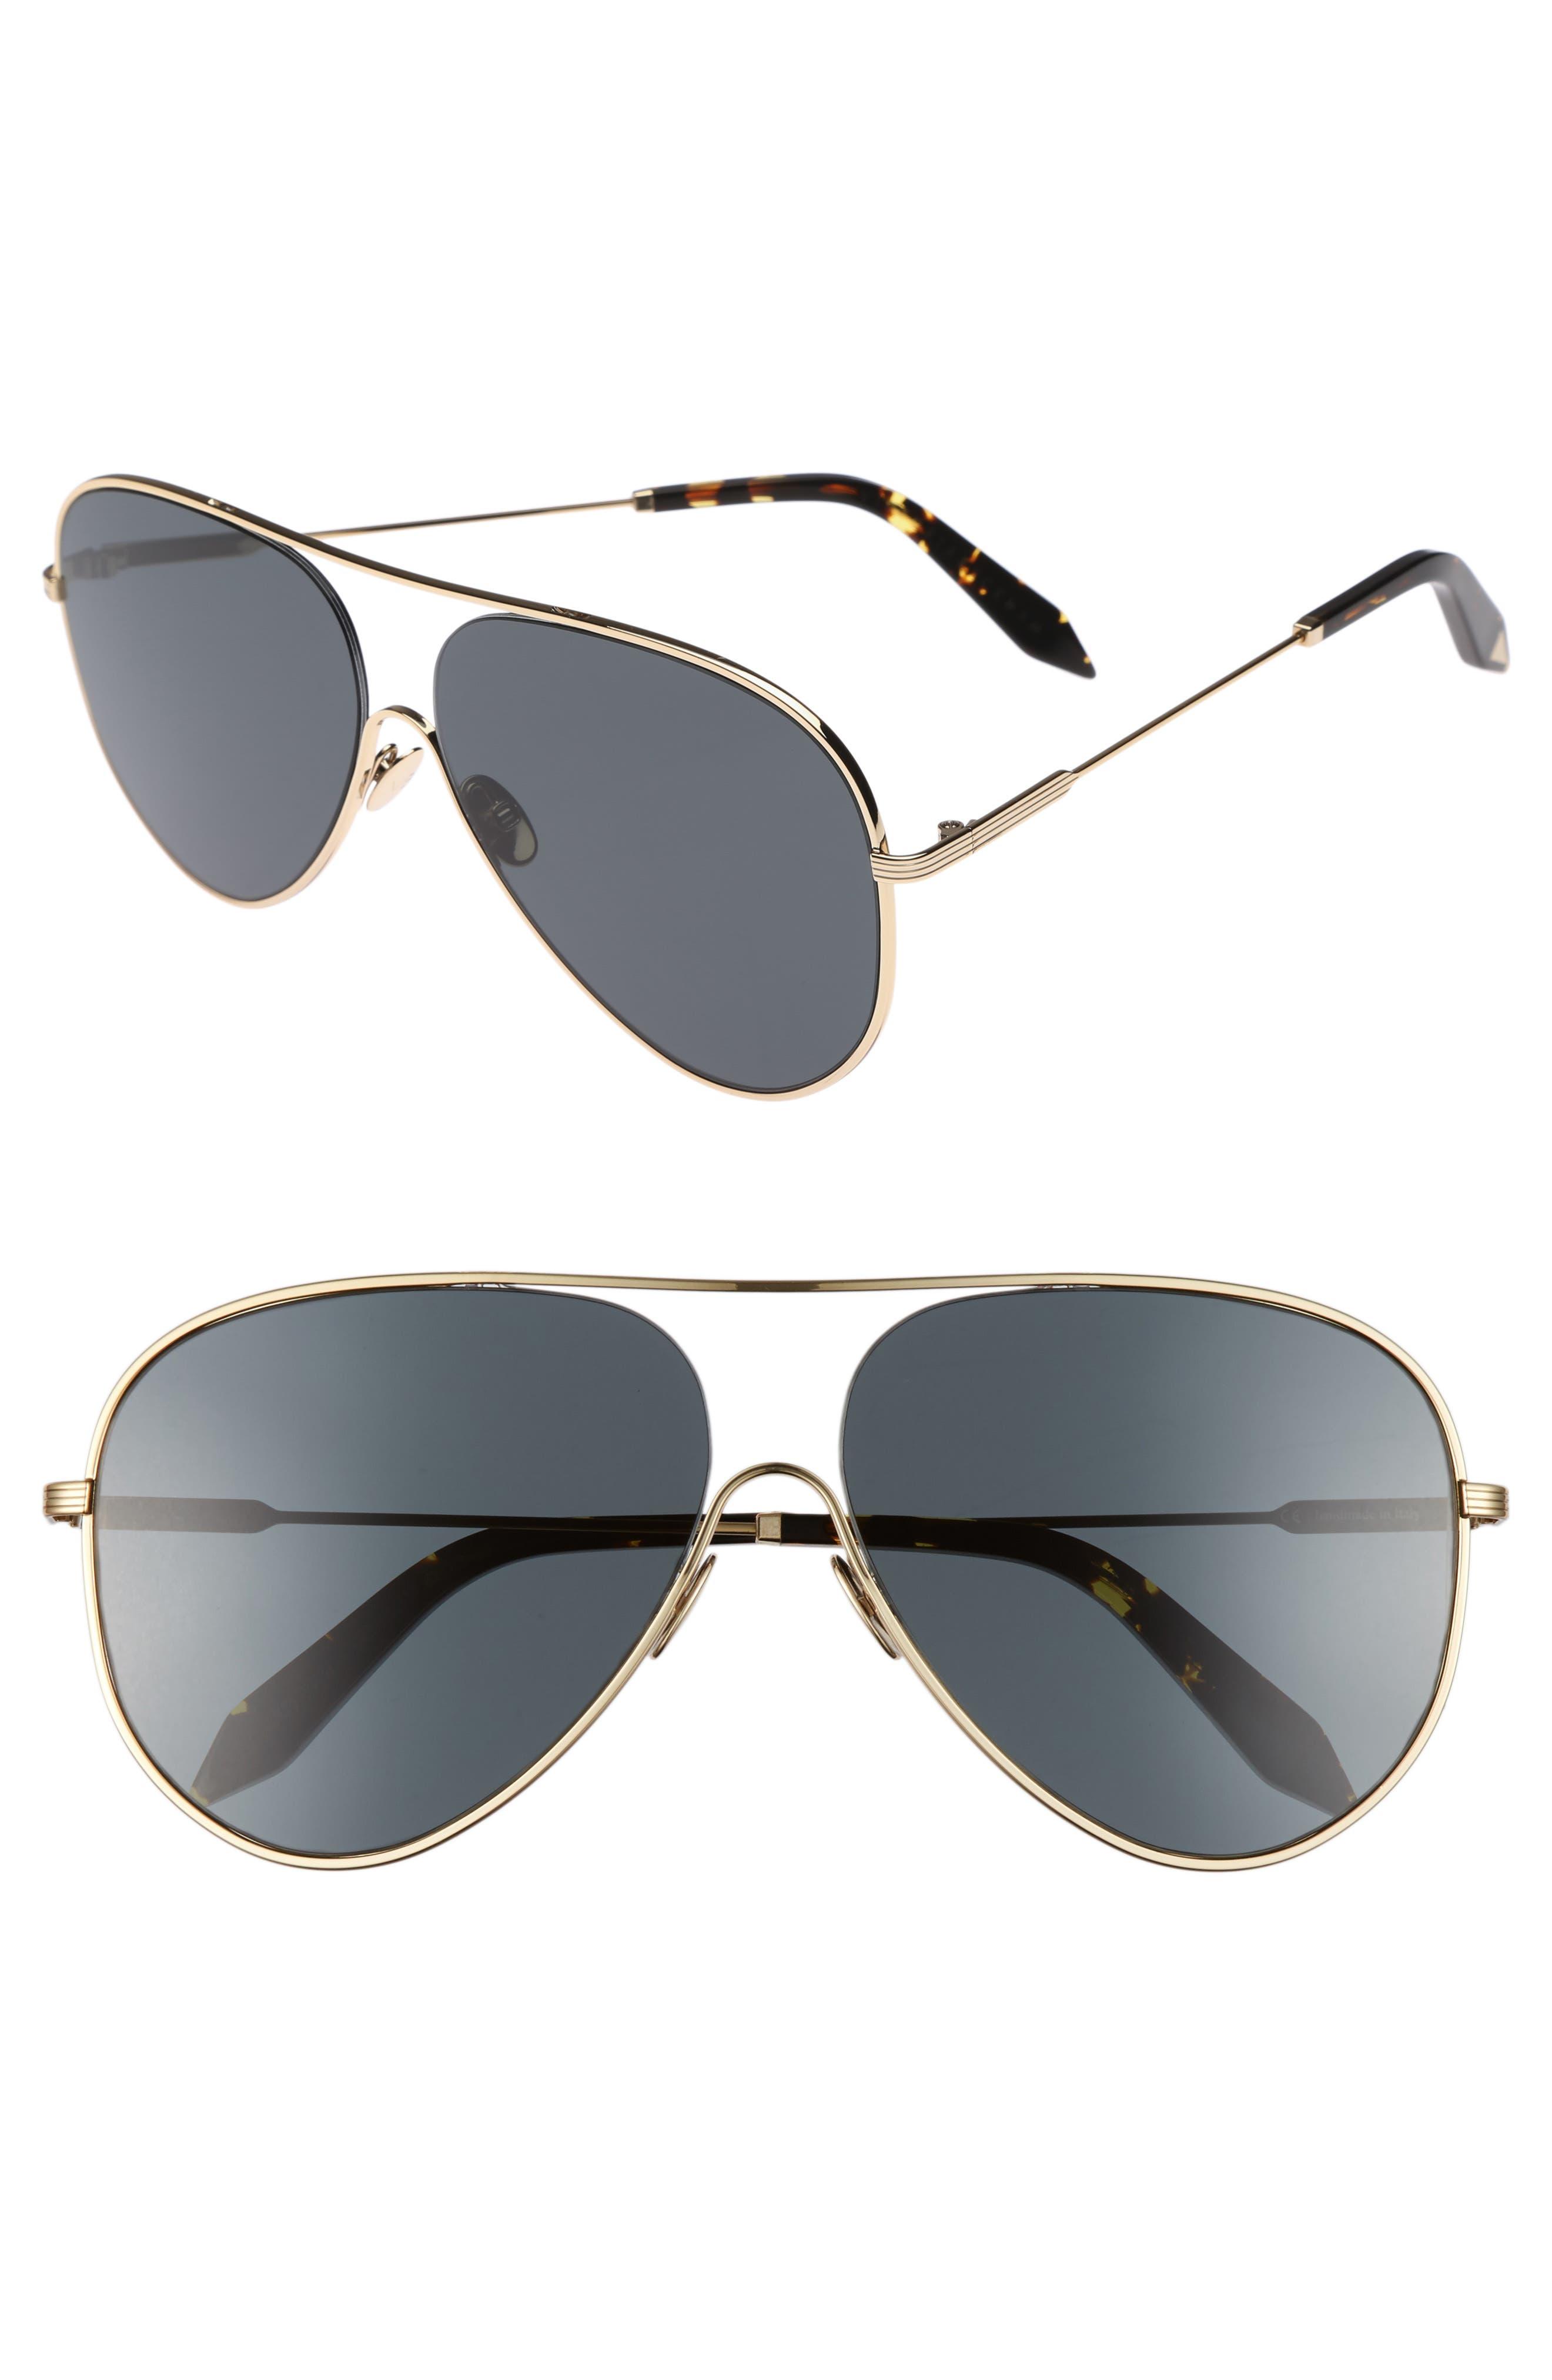 VICTORIA BECKHAM, Loop 62mm Oversize Aviator Sunglasses, Main thumbnail 1, color, 020